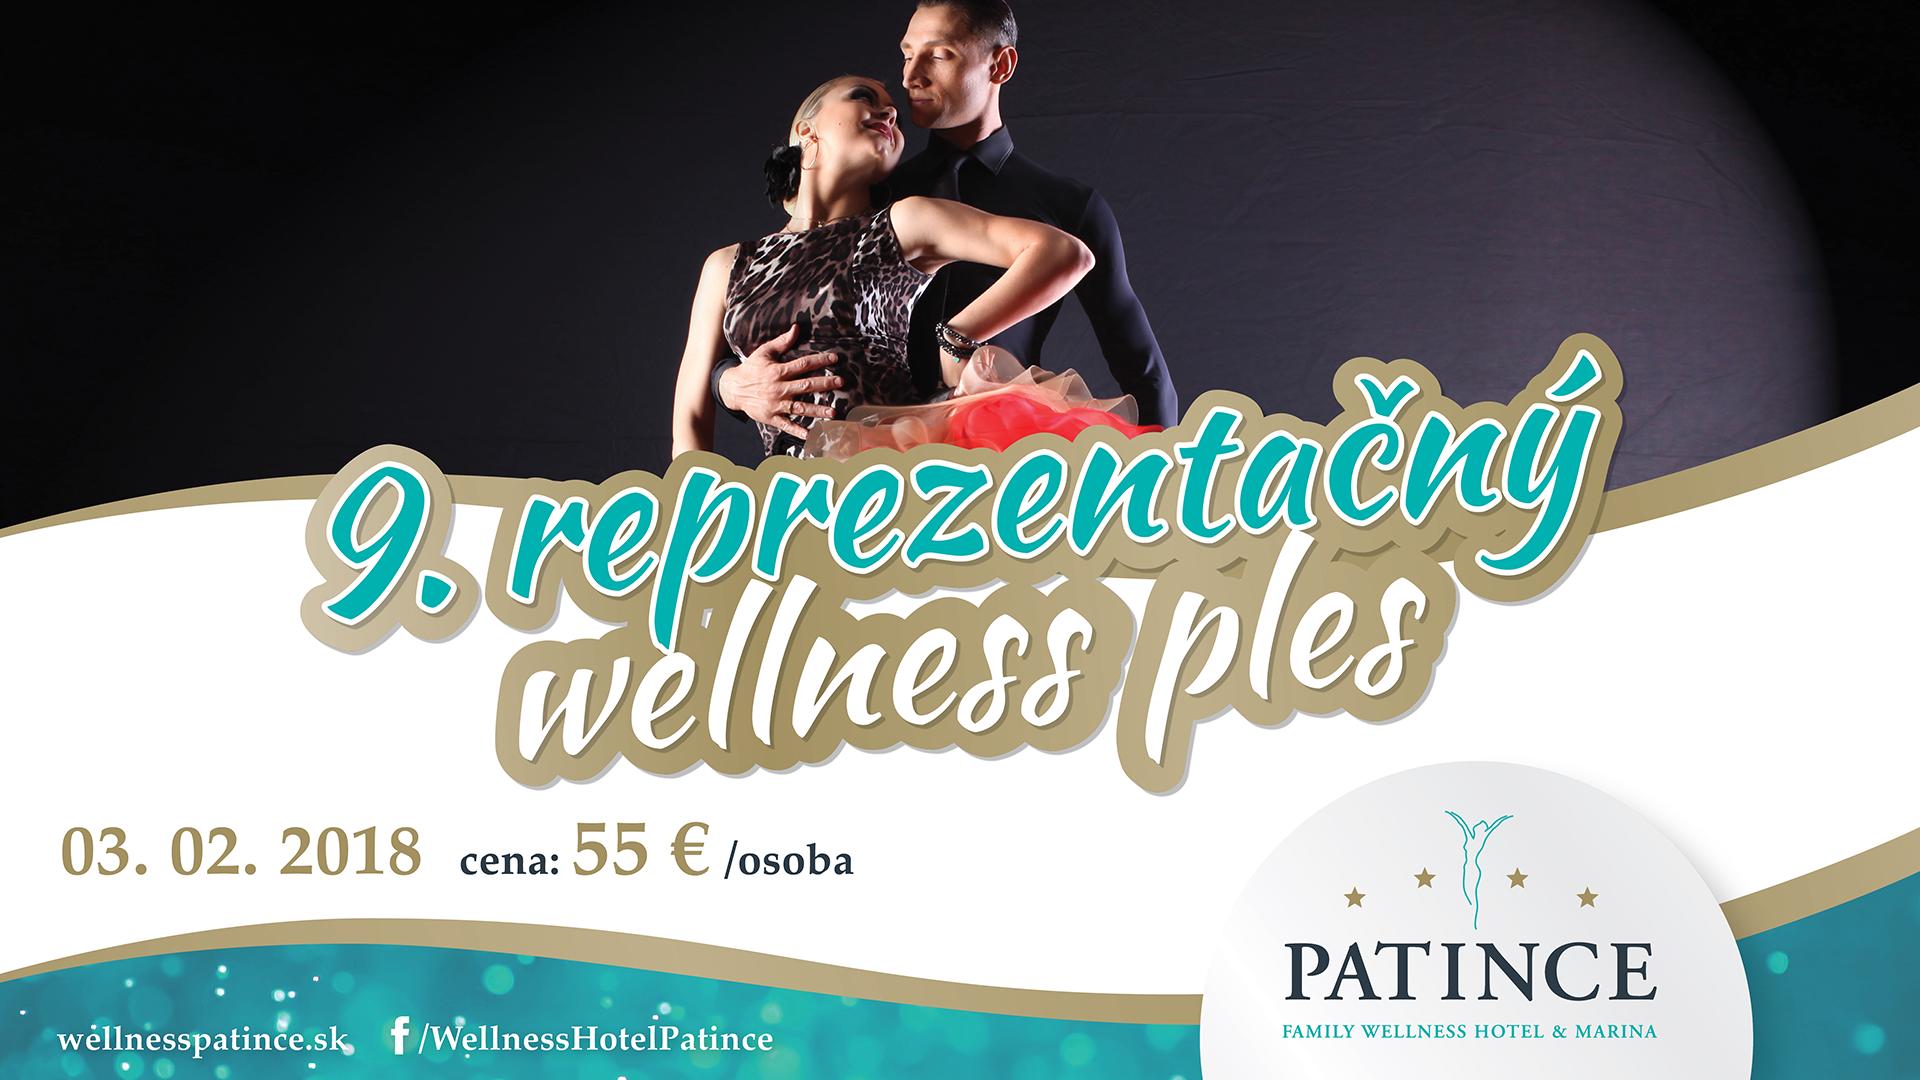 9.reprezetačný wellnes ples v Patinci - Katalóg firiem  3e927883e72